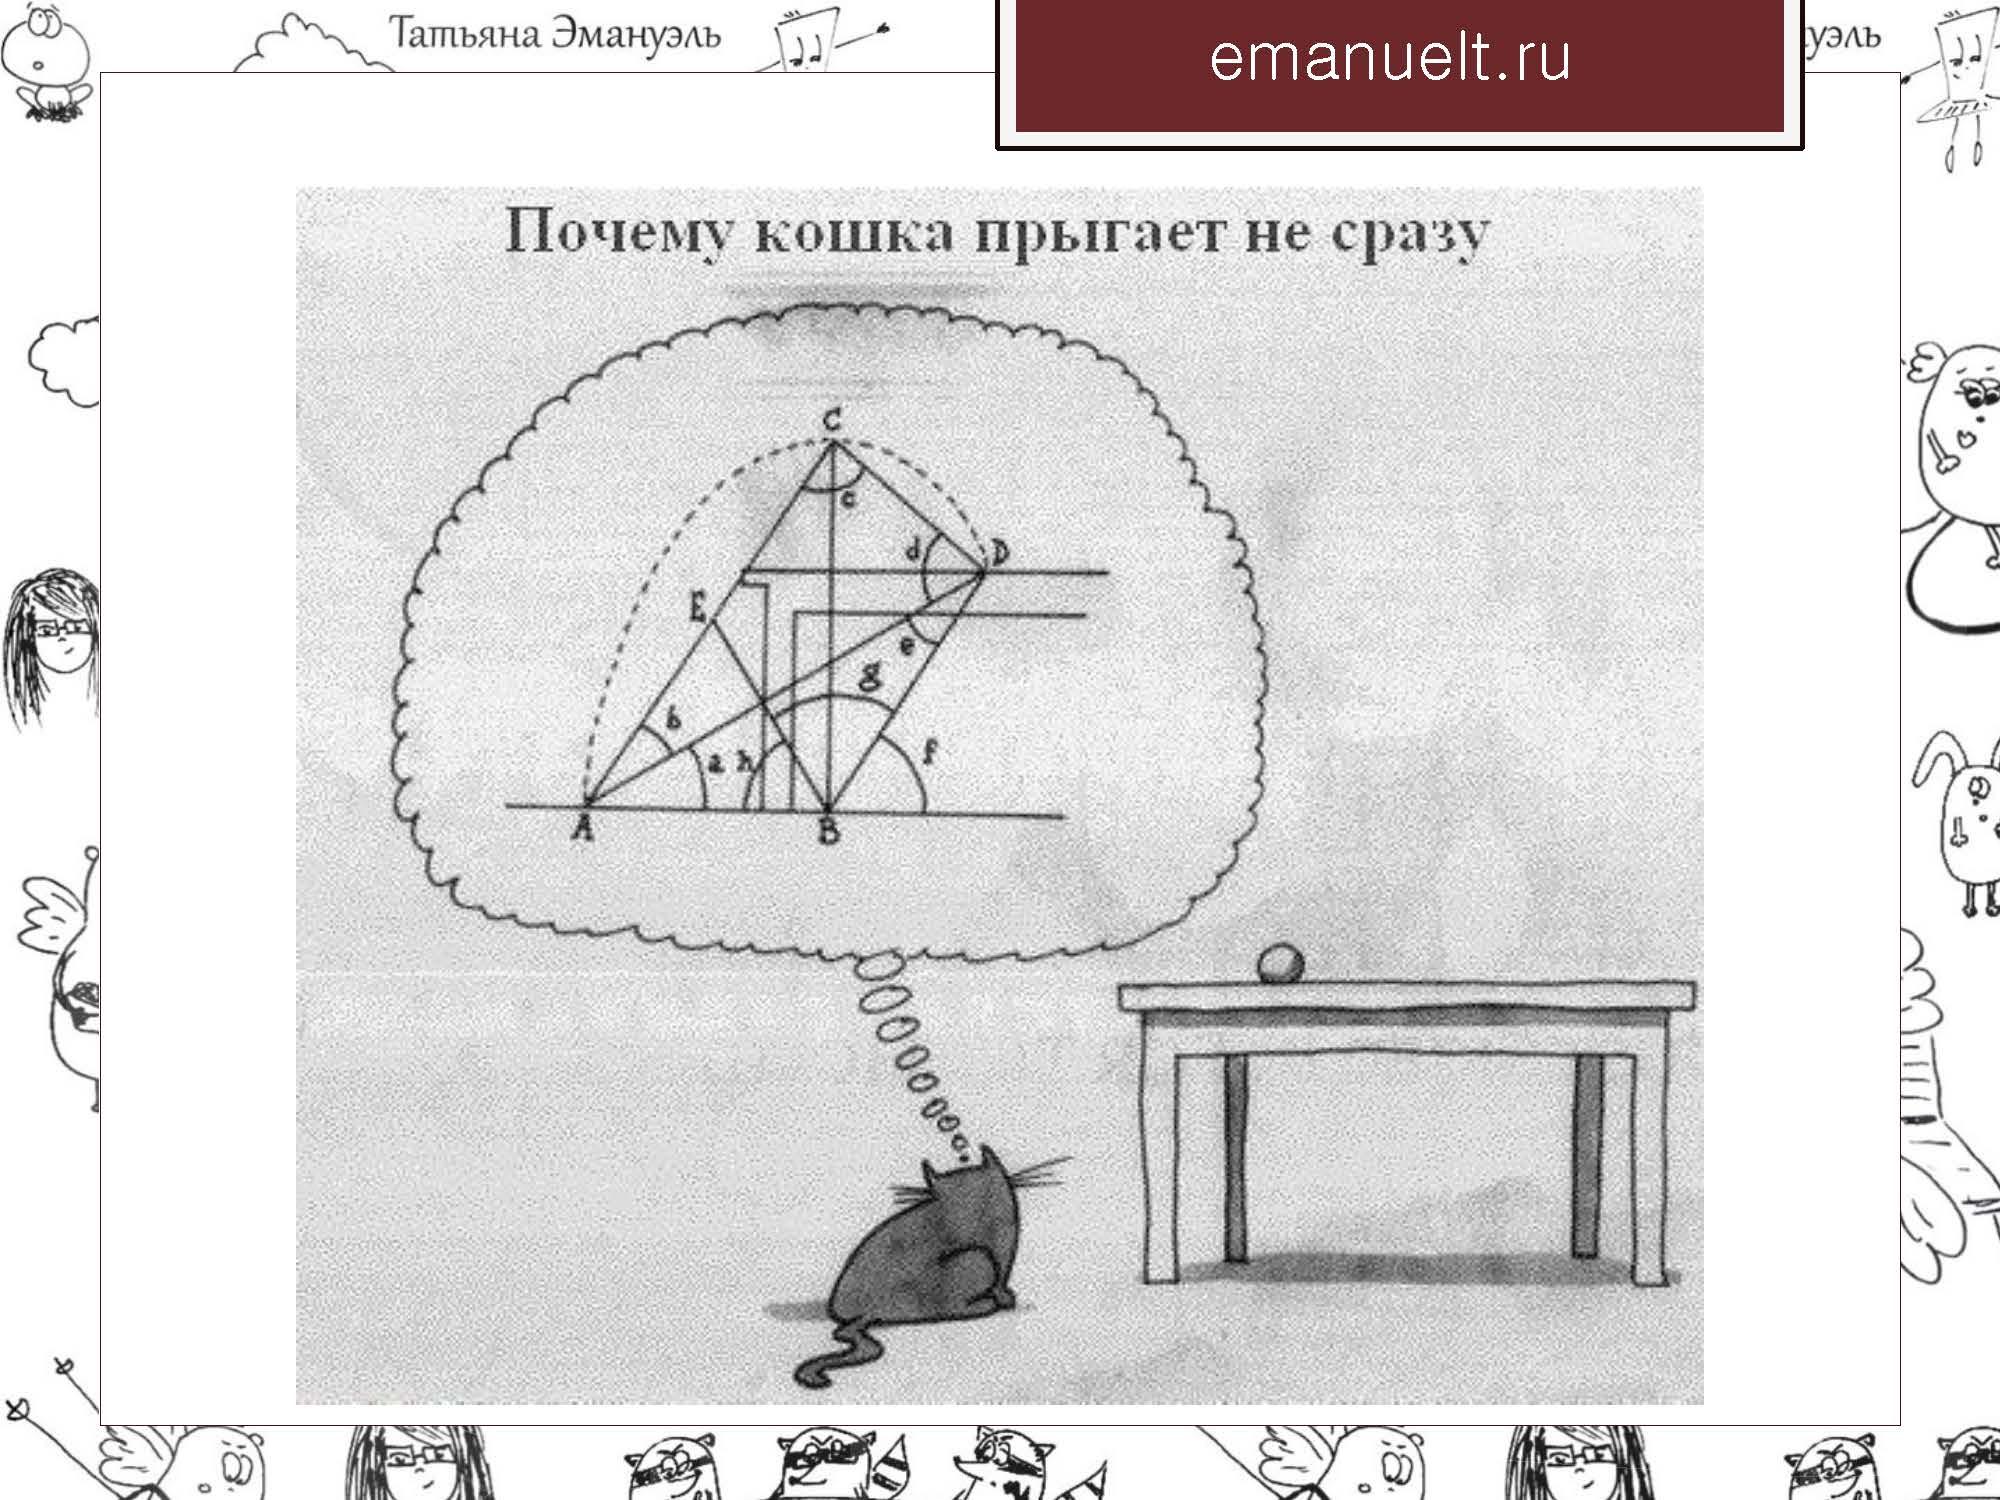 06 февраля эмануэль_Страница_044